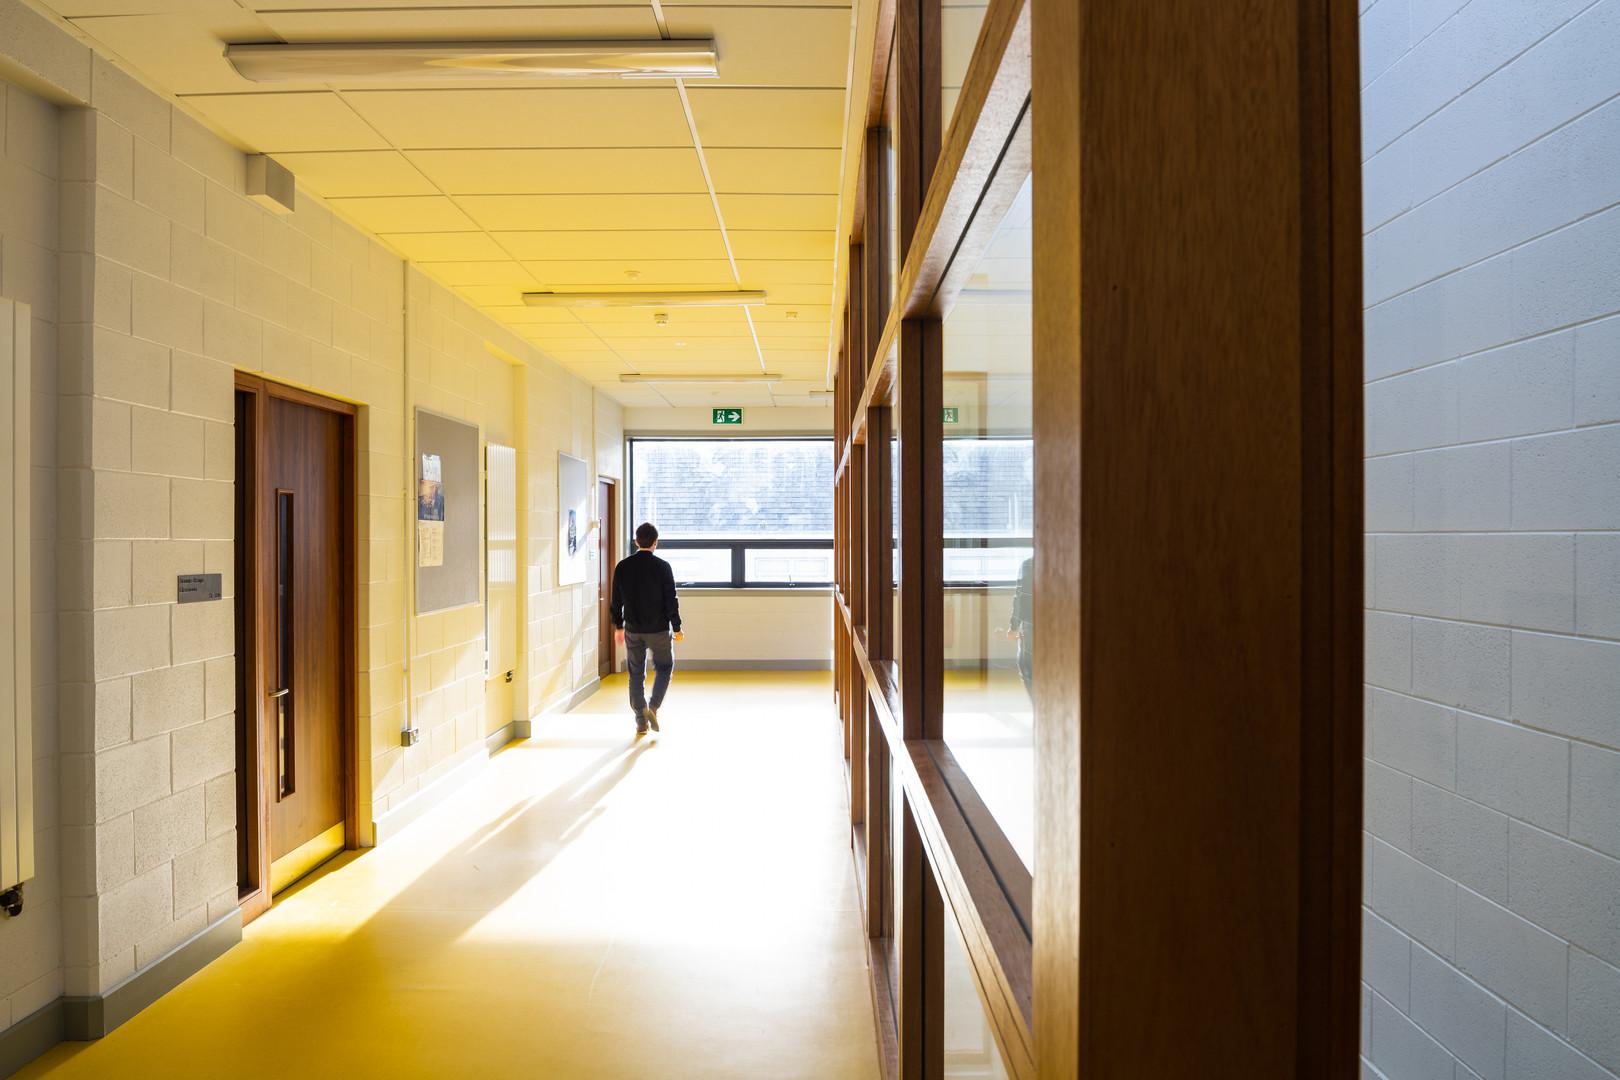 Internal corridor with yellow linoleum floor of Colaiste Iosaef, Kilmallock, Limerick